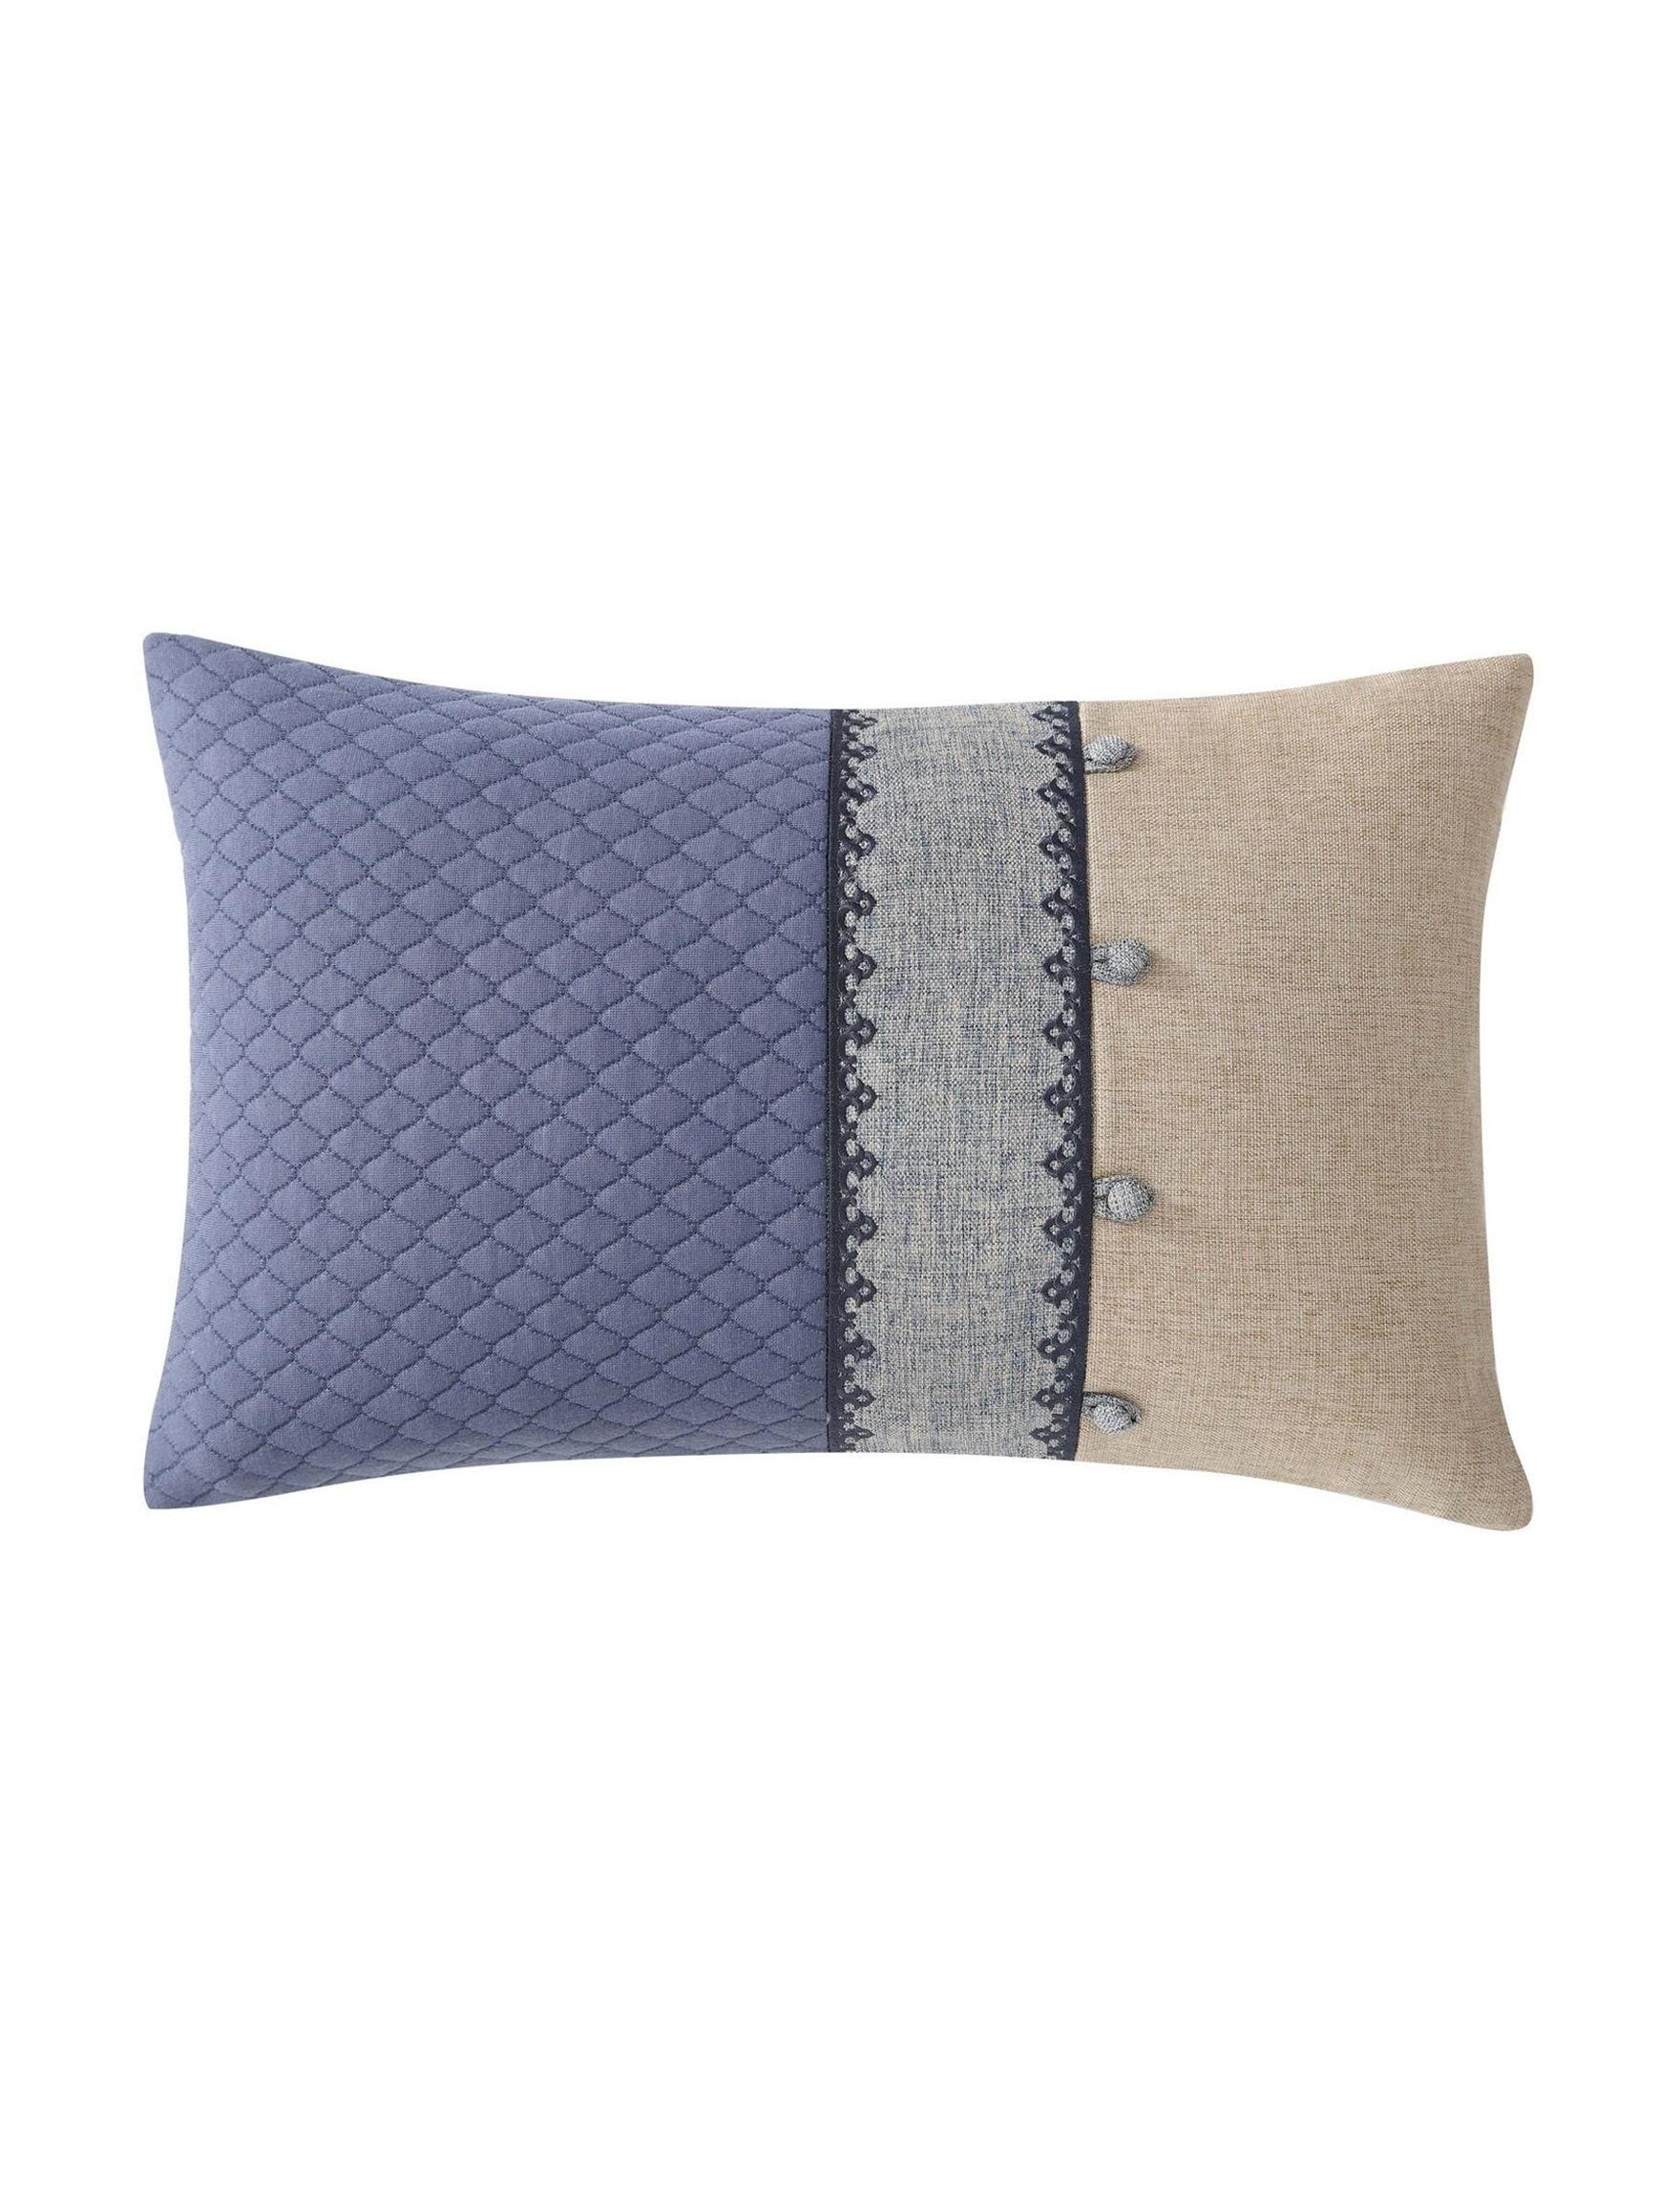 Charisma Multi Decorative Pillows